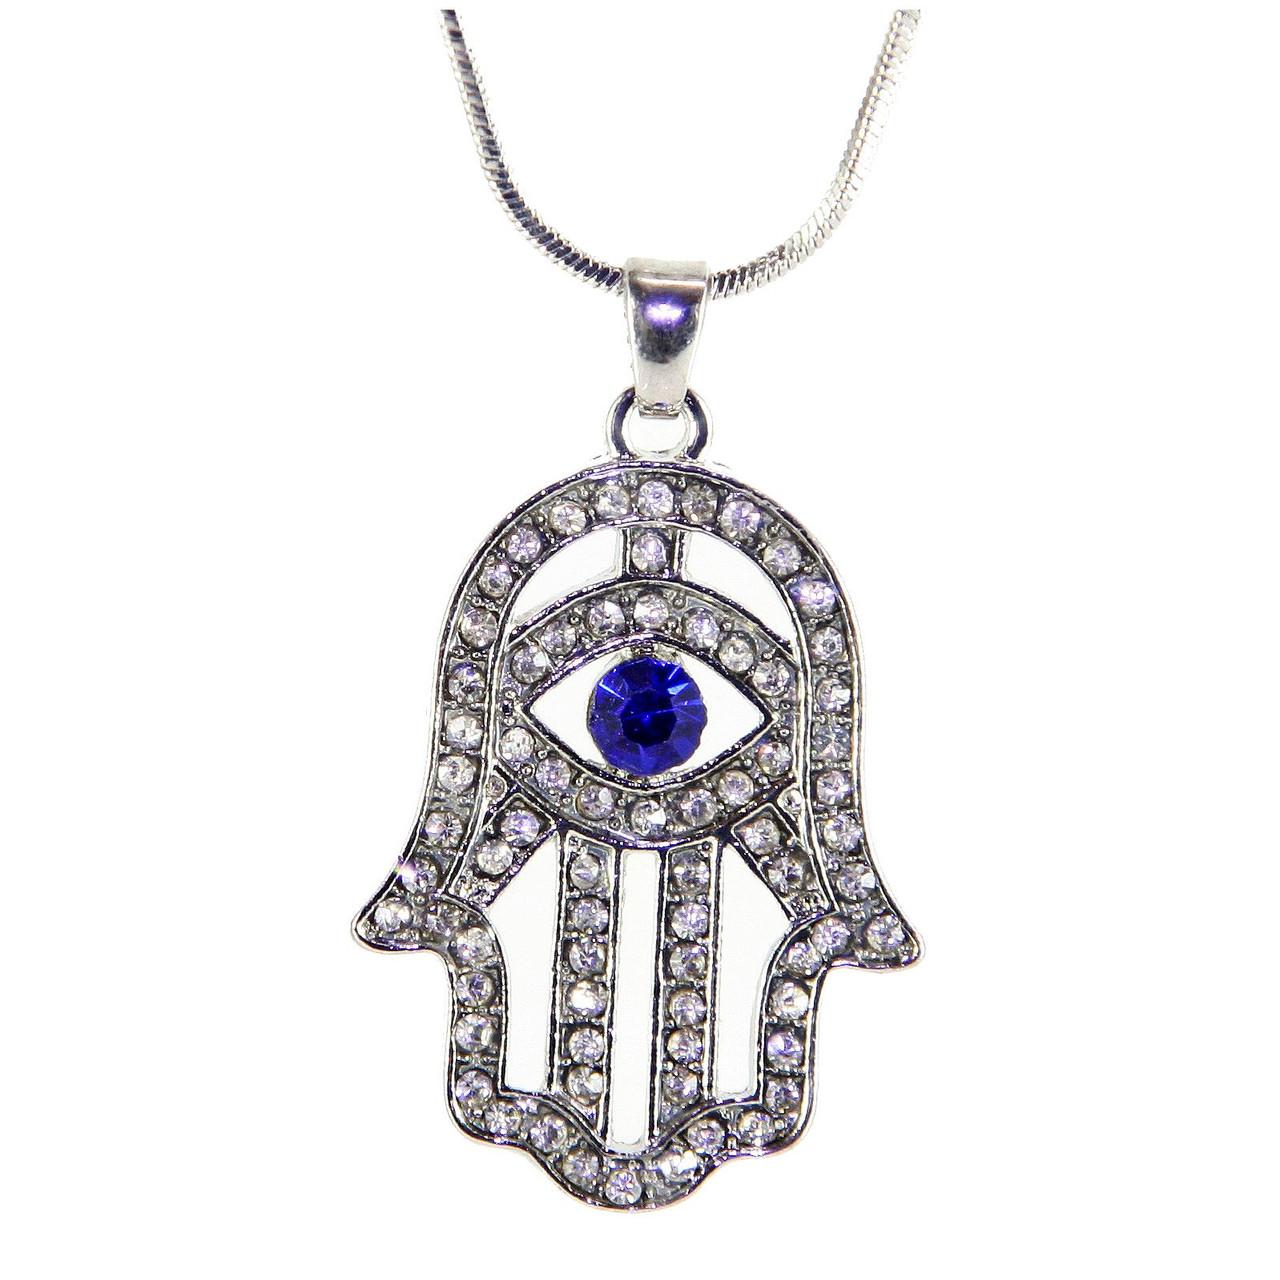 Pink Evil Eye Necklace LUCKY Charm Amulet Pendant Jewelry Judaica Kabbalah